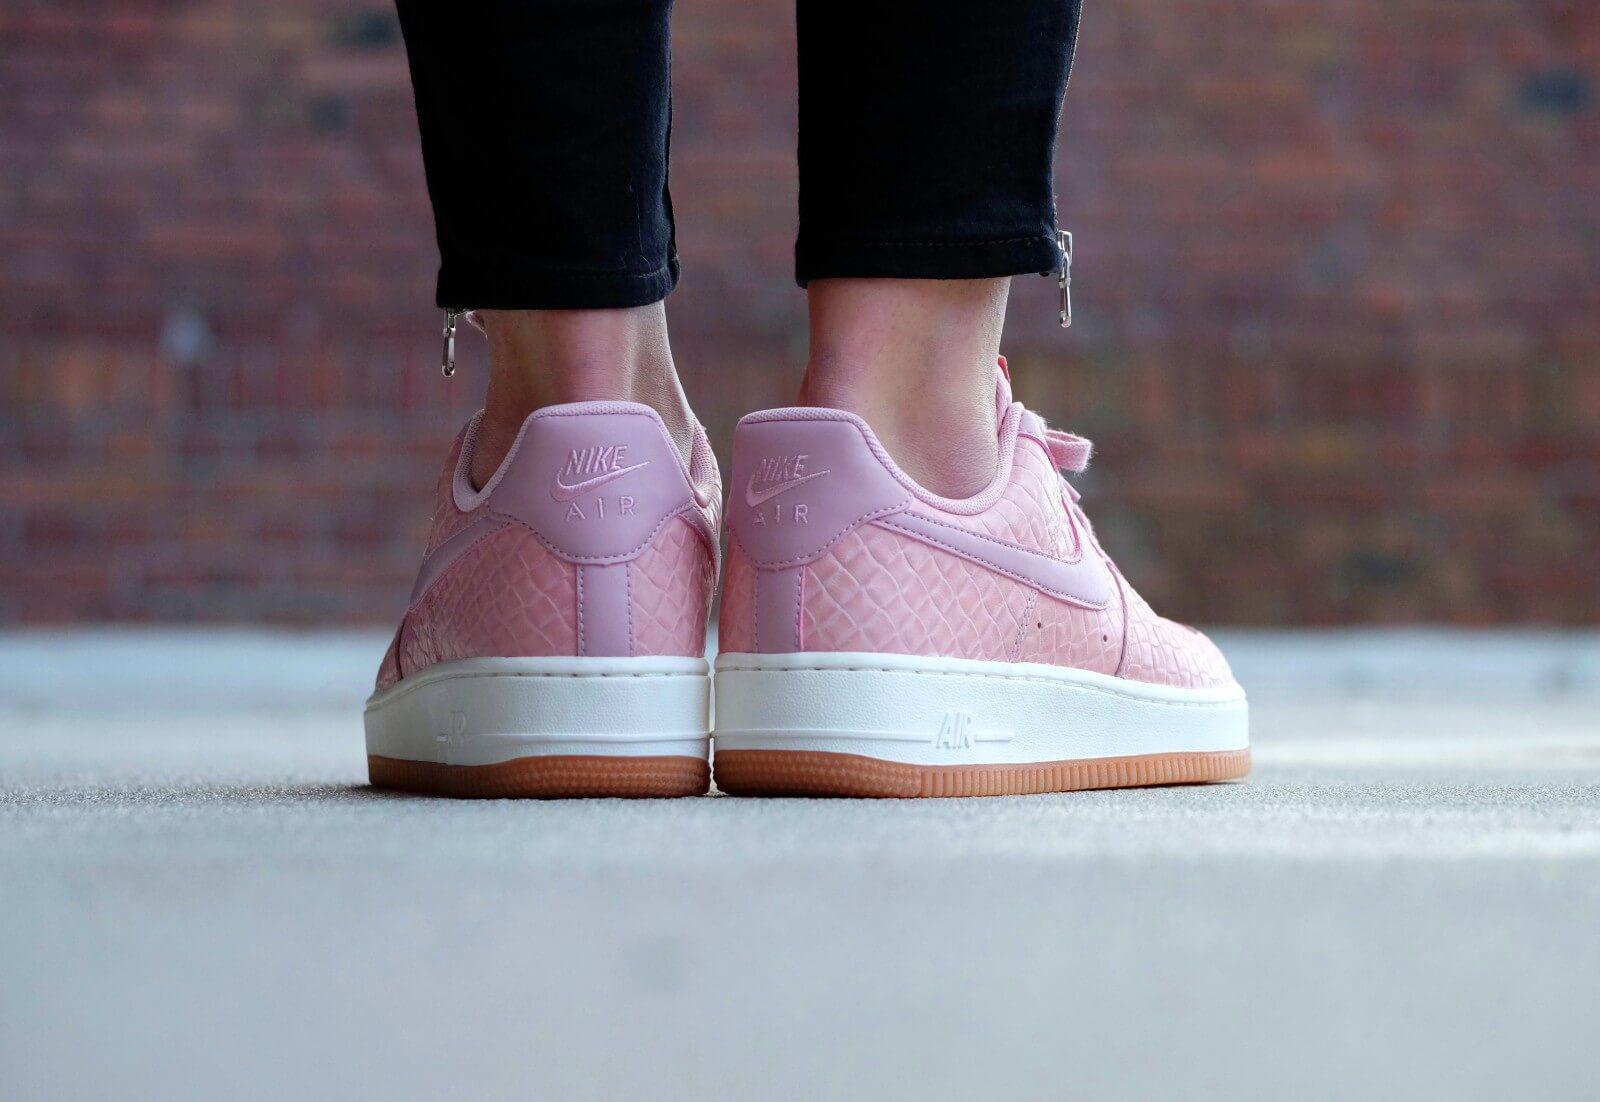 Nike Wmns Air Force 1 07 Pink Glaze Pink Glaze Pink Glaze